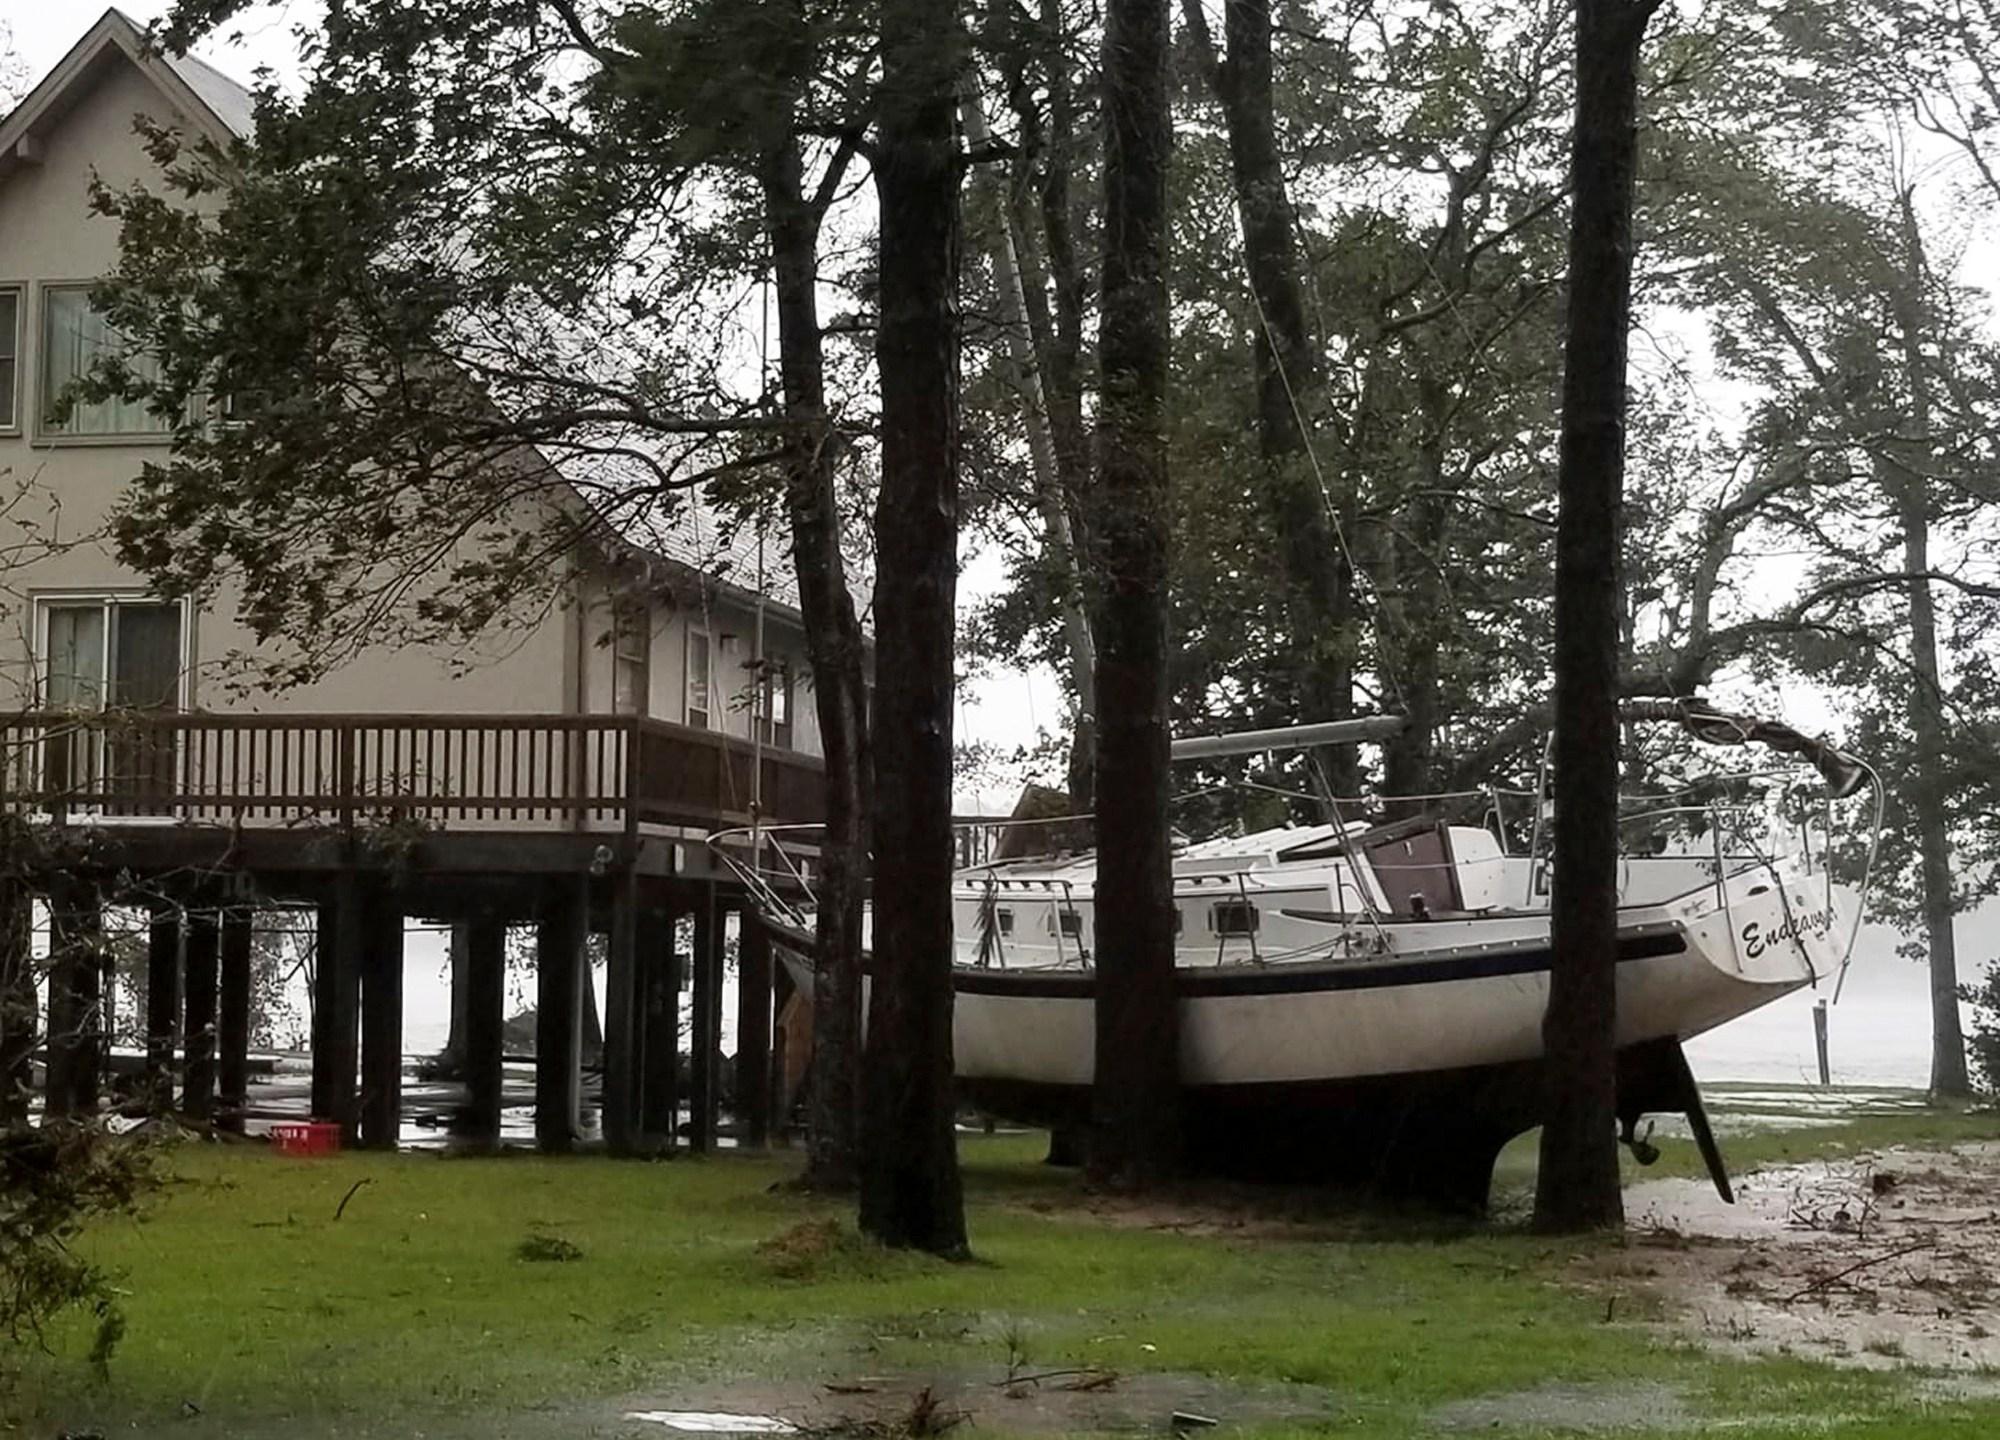 Tropical_Weather_North_Carolina_78124-159532.jpg33148185